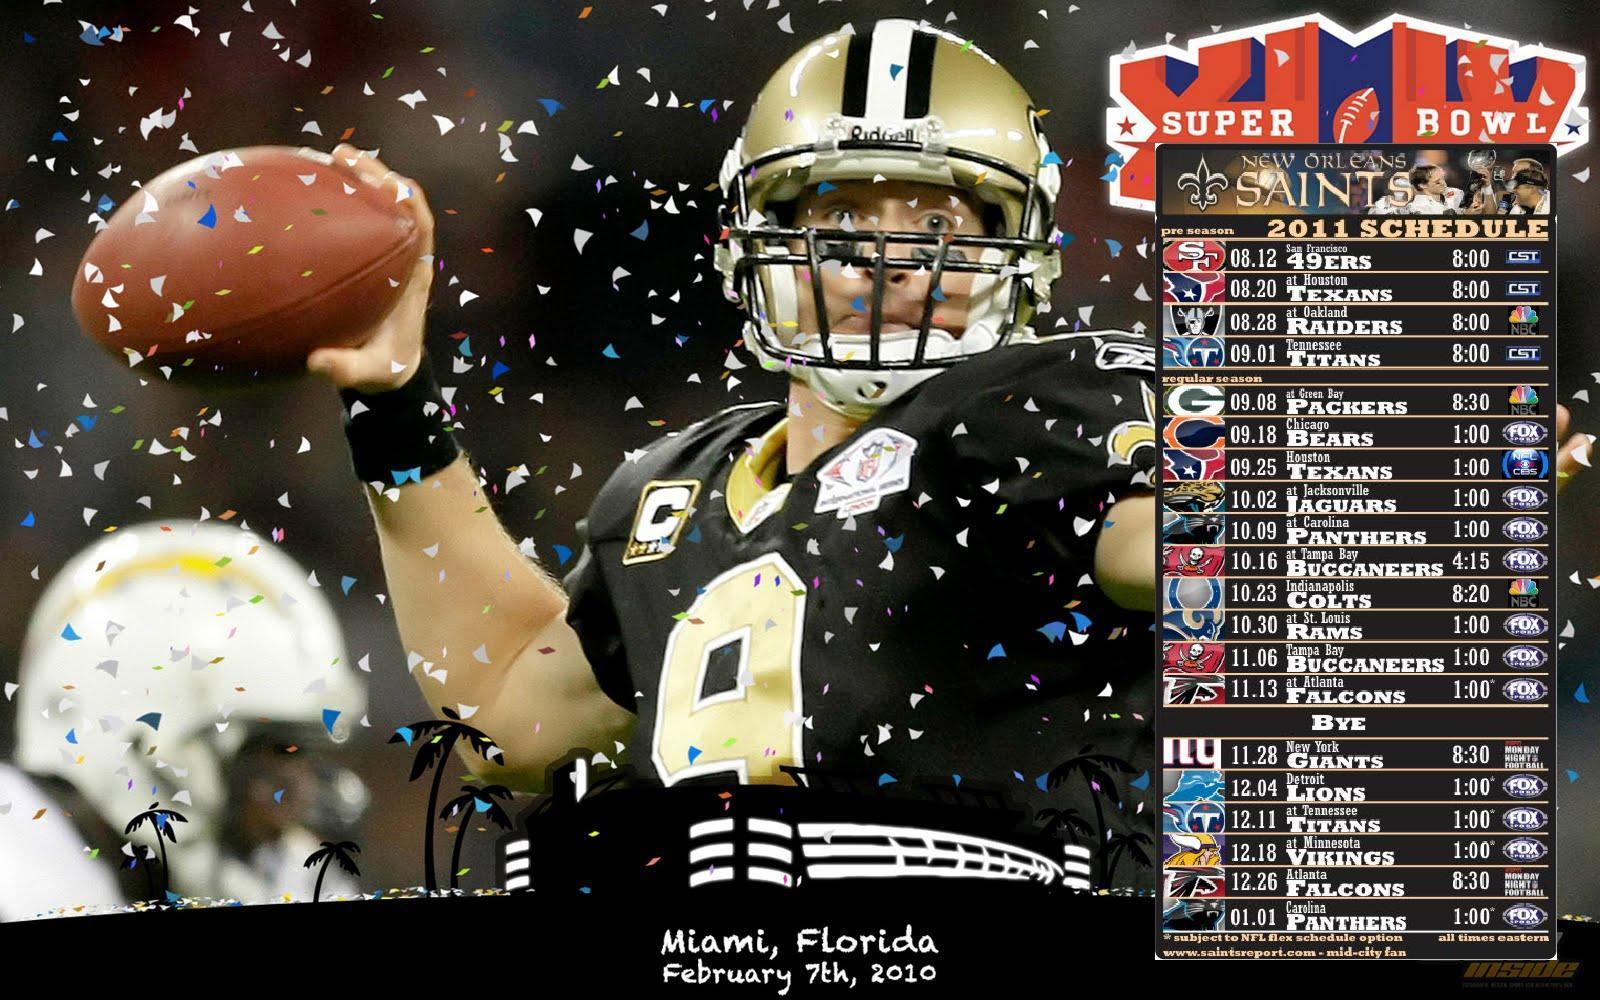 New Orleans Saints HD background New Orleans Saints wallpapers 1600x1000